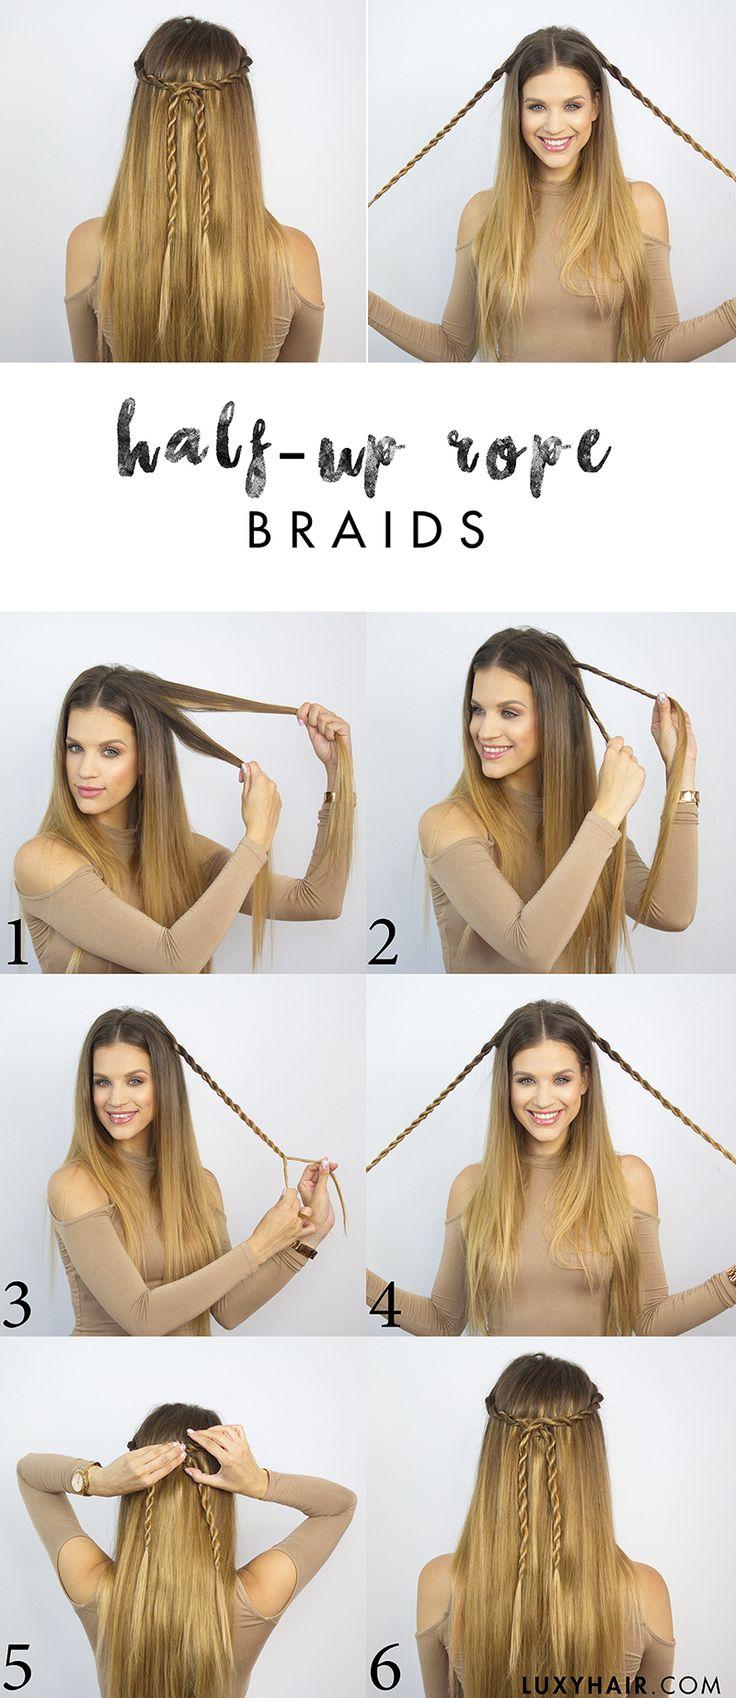 6 Heatless Back To School Hairstyles